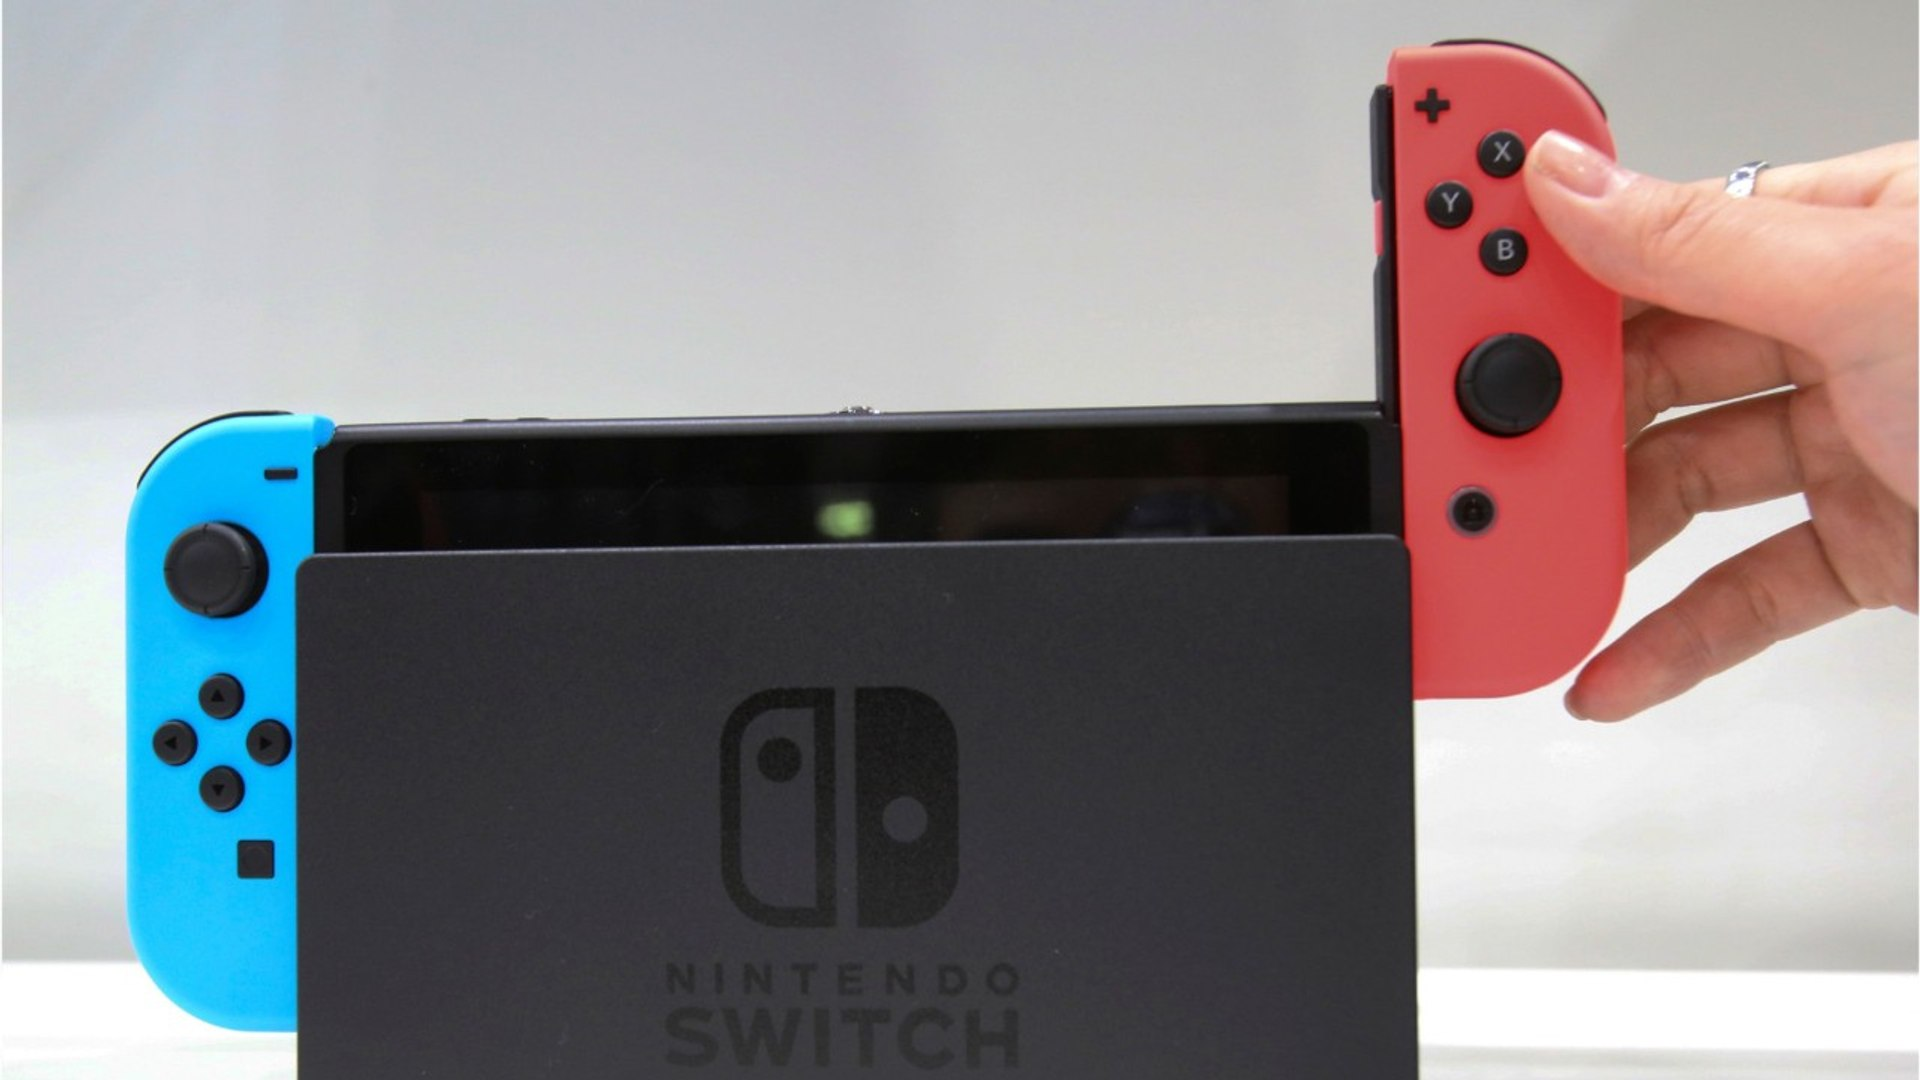 Nintendo Direct Finally Rescheduled For Tomorrow